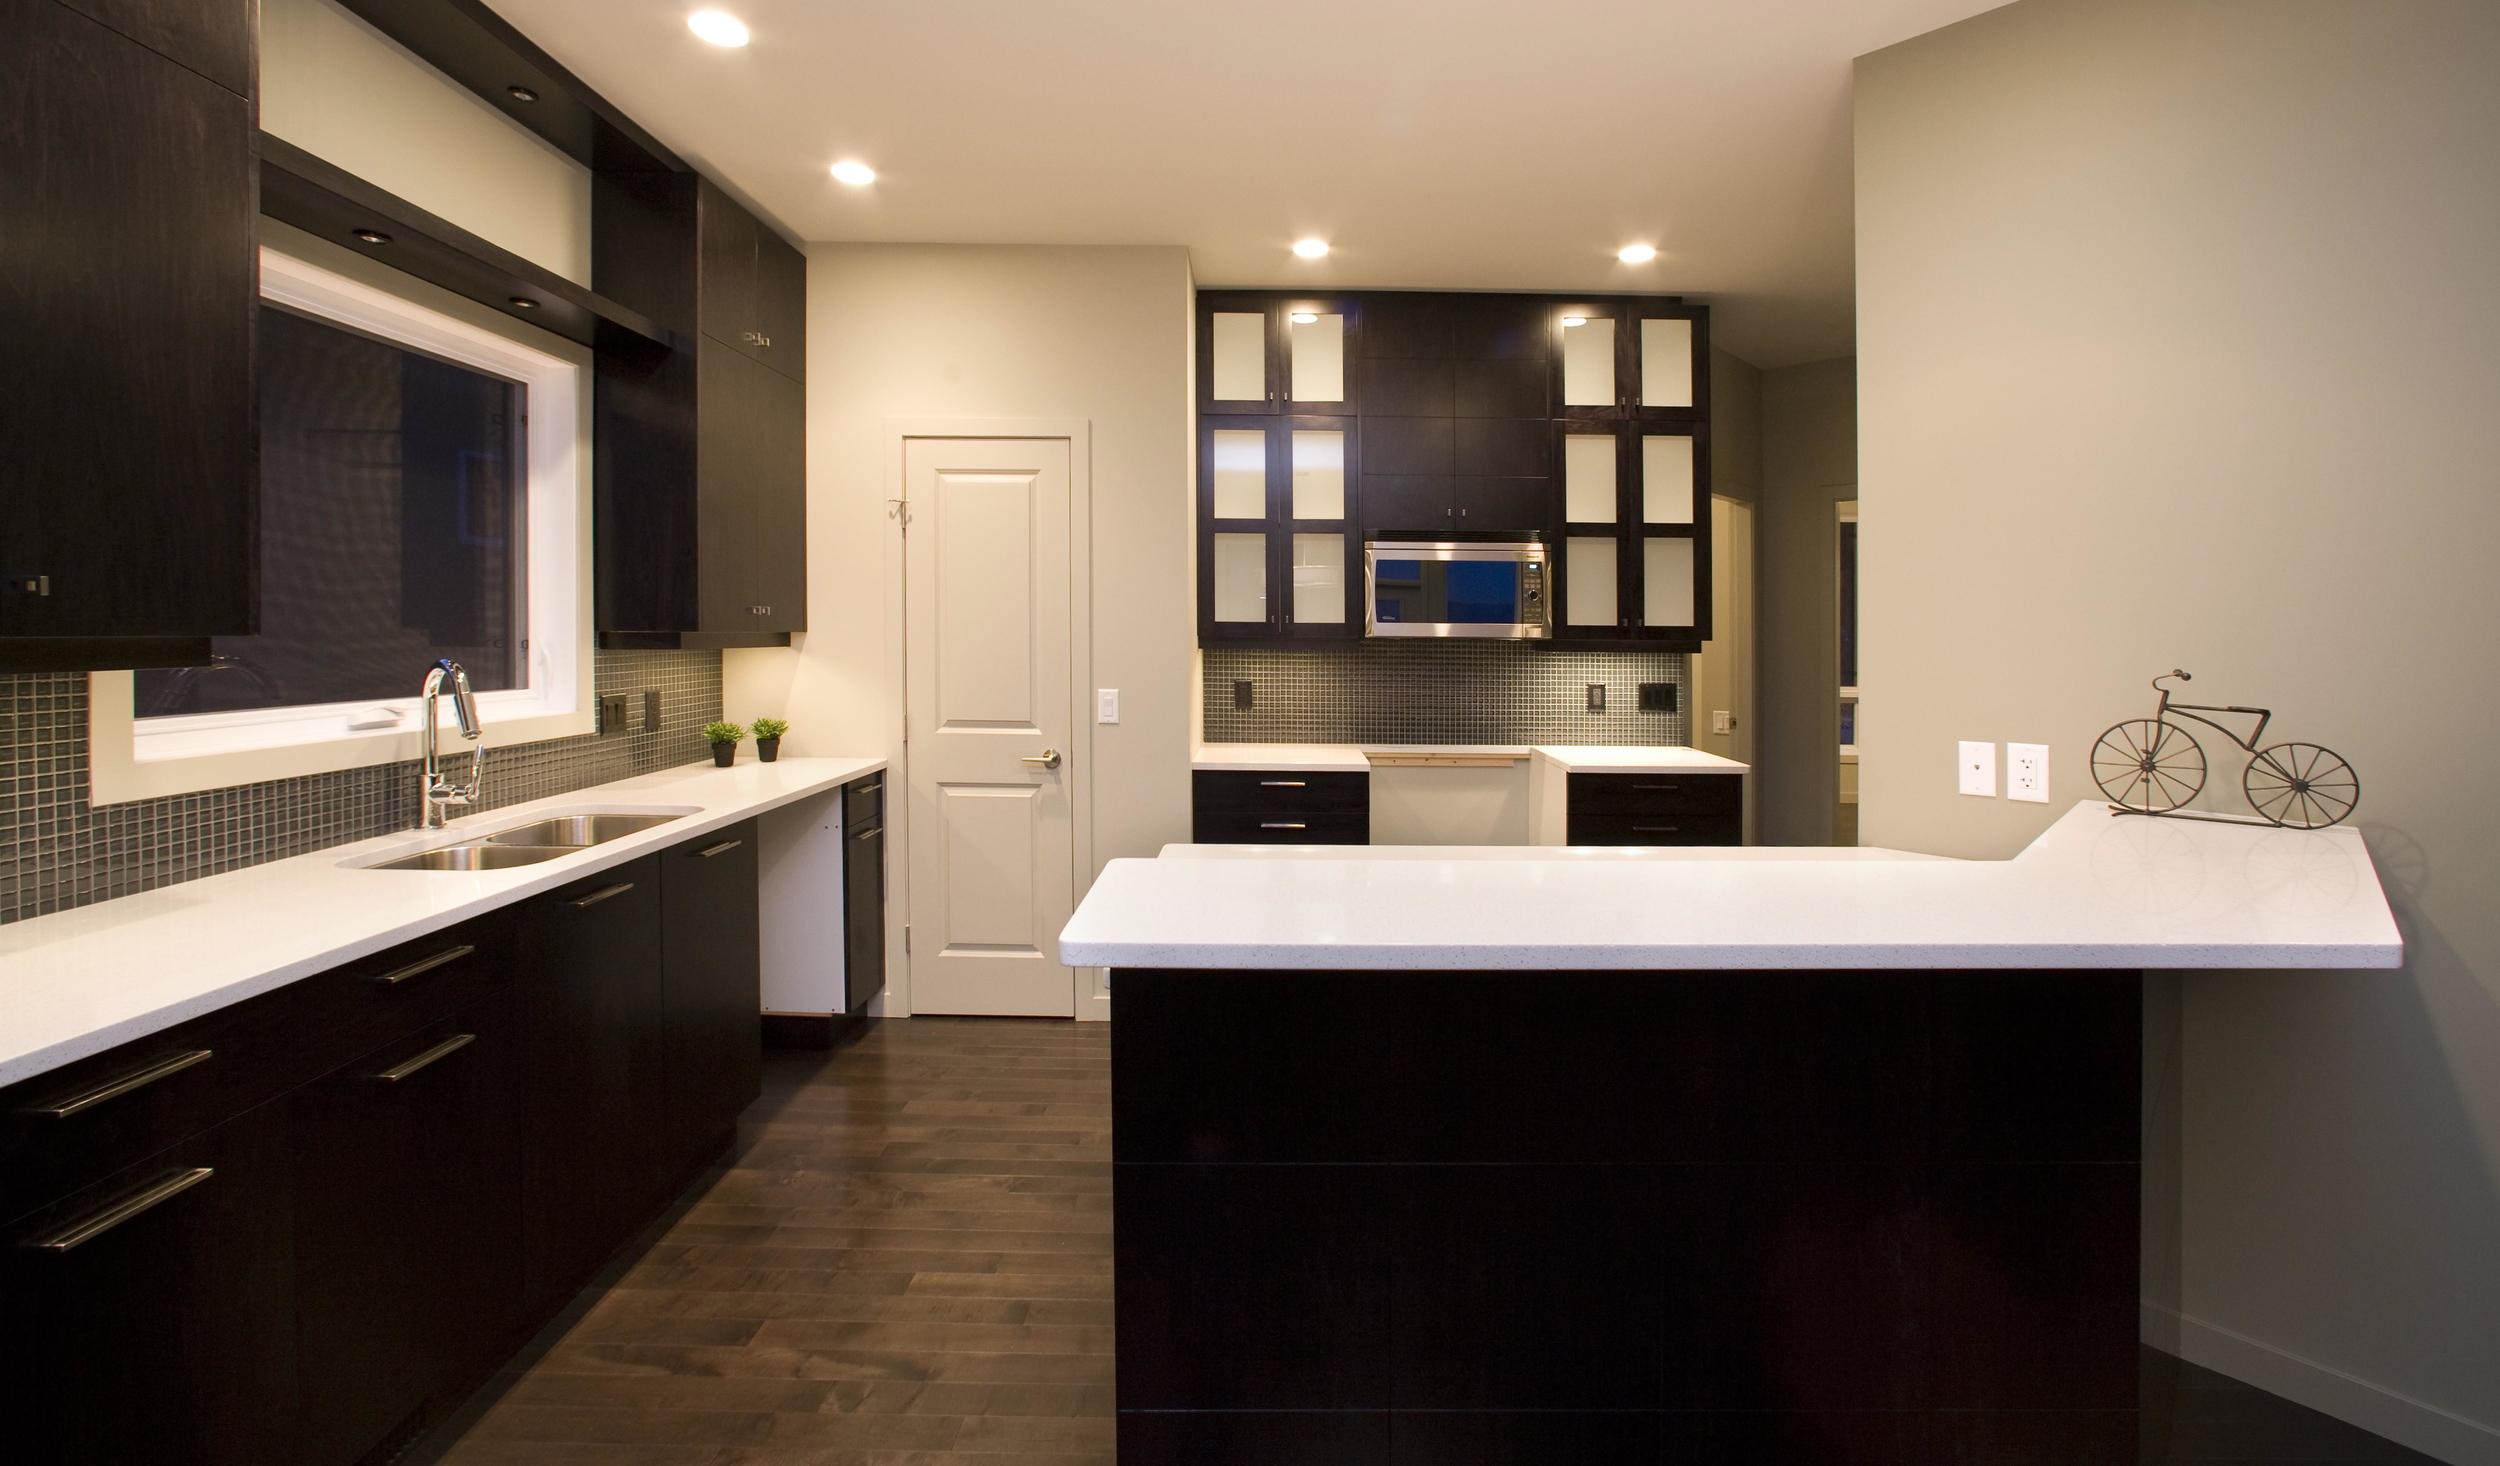 contemporary-espresso-wood-kitchen-cabinetry.jpg